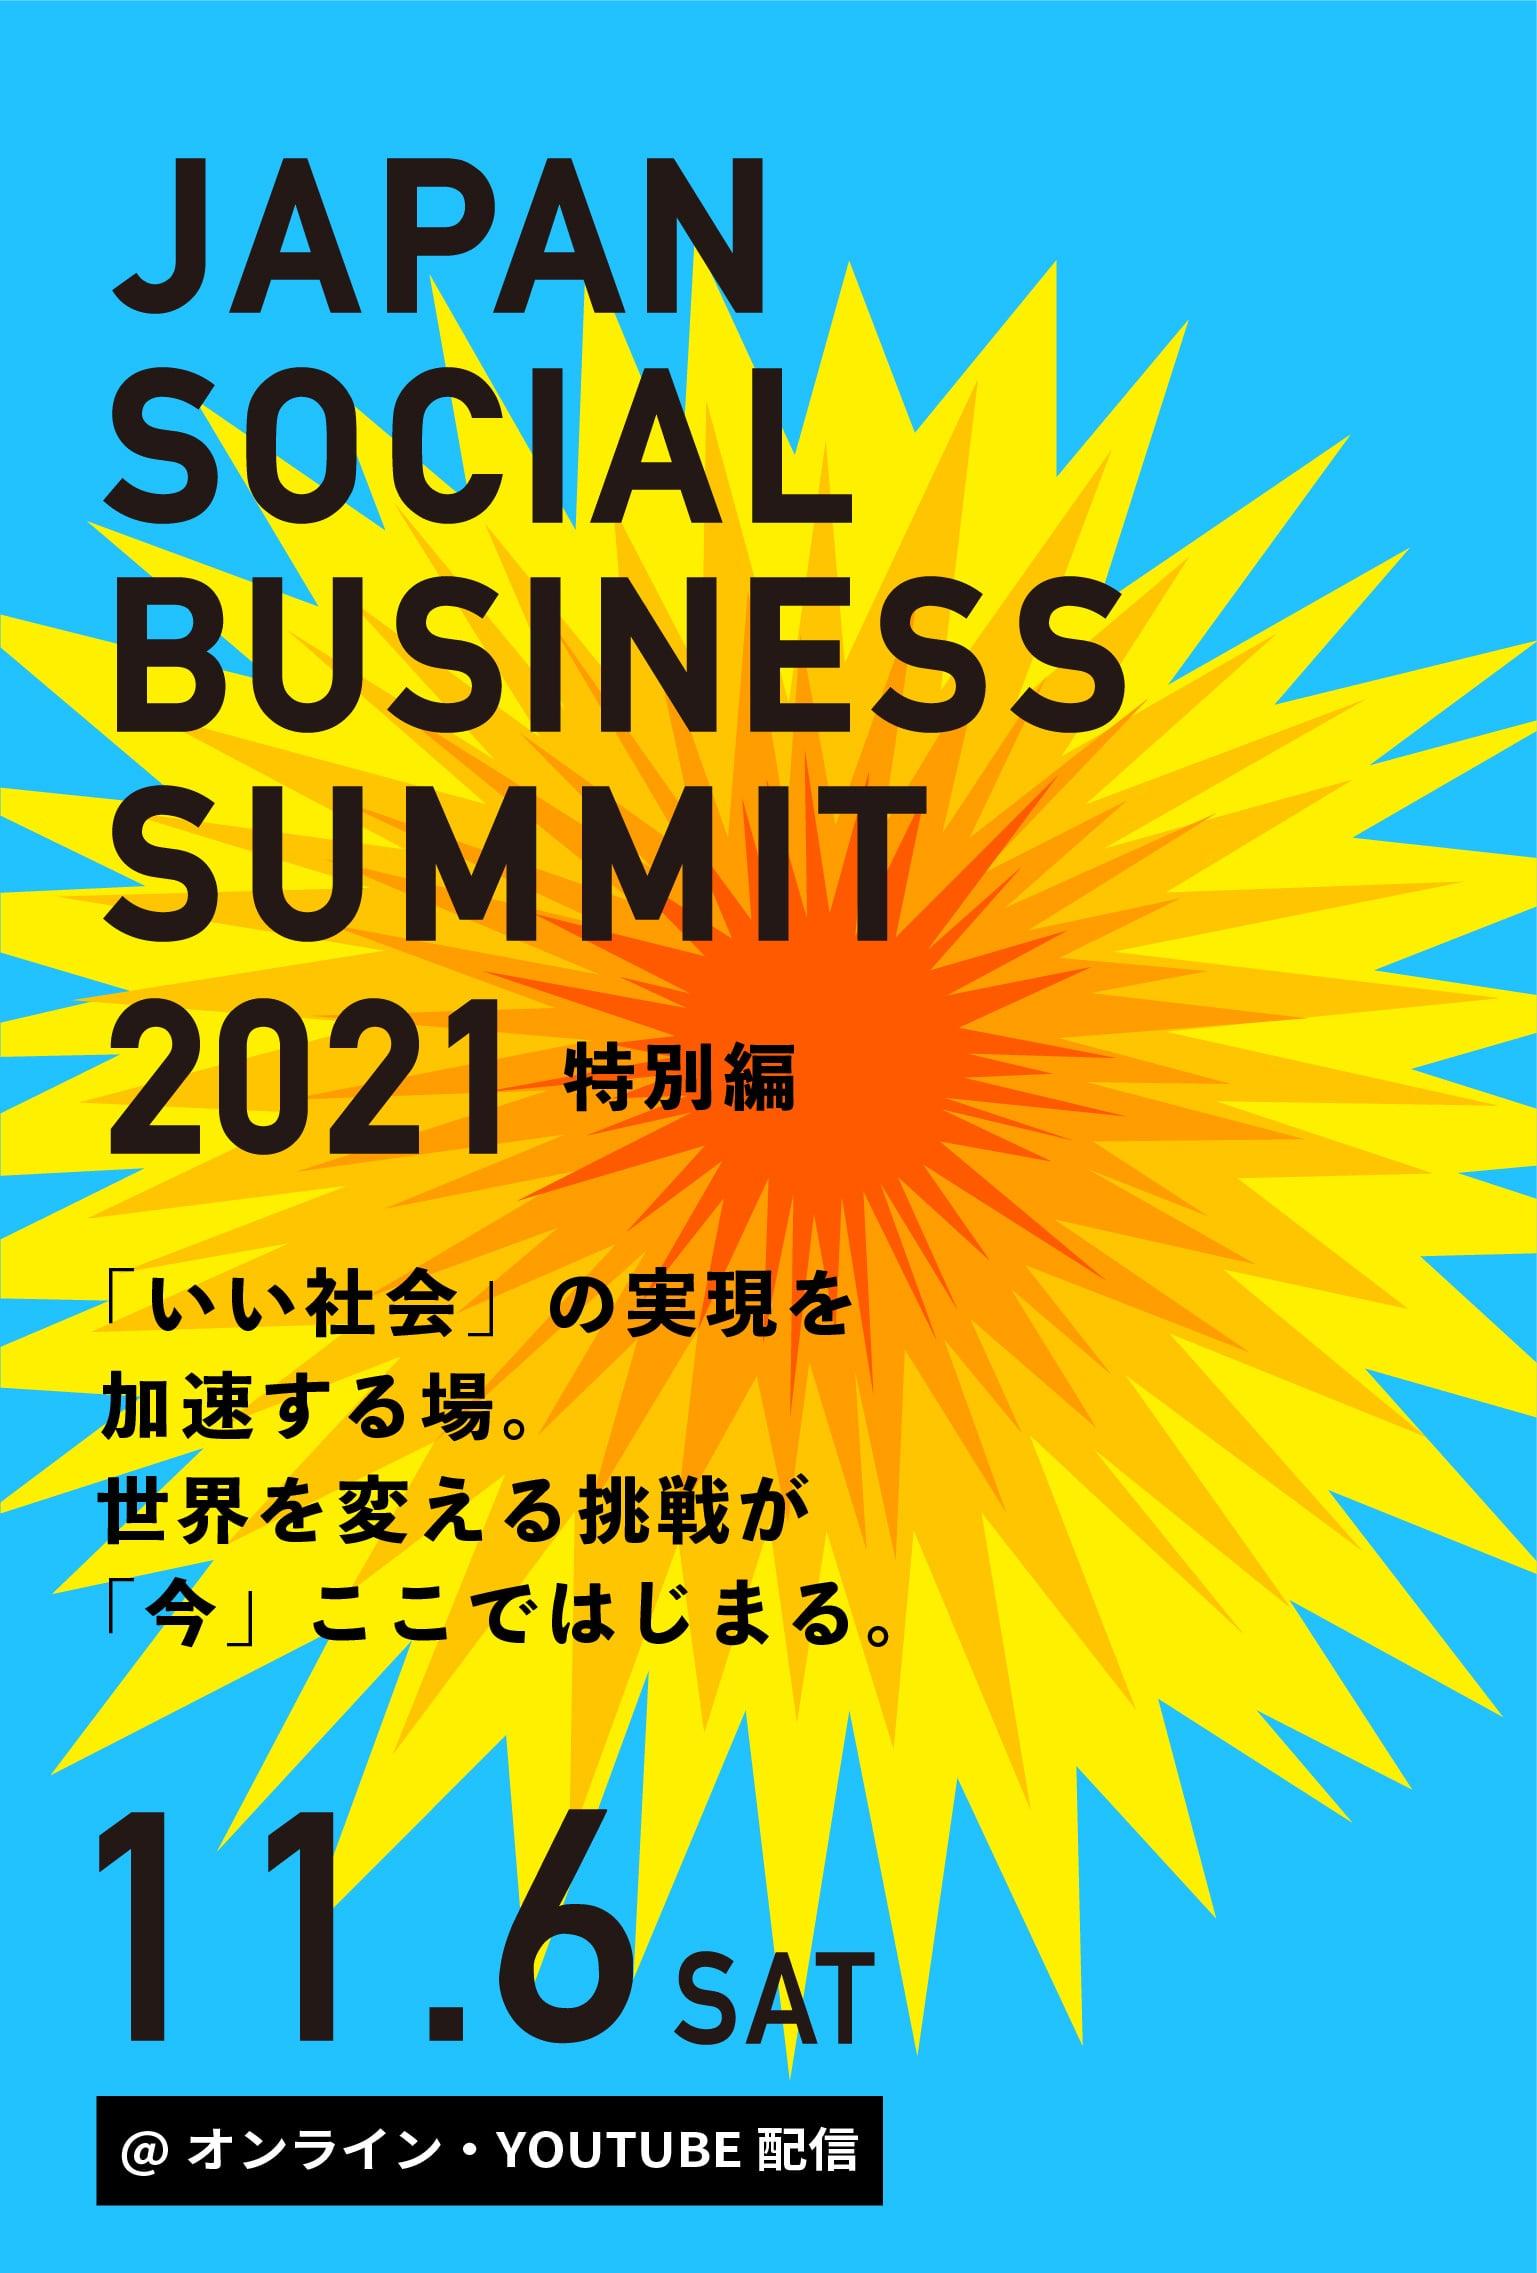 JAPAN SOCIAL BUSINESS FES 2020 日本を代表する社会起業家が集結!ここから、未来が動き出す。